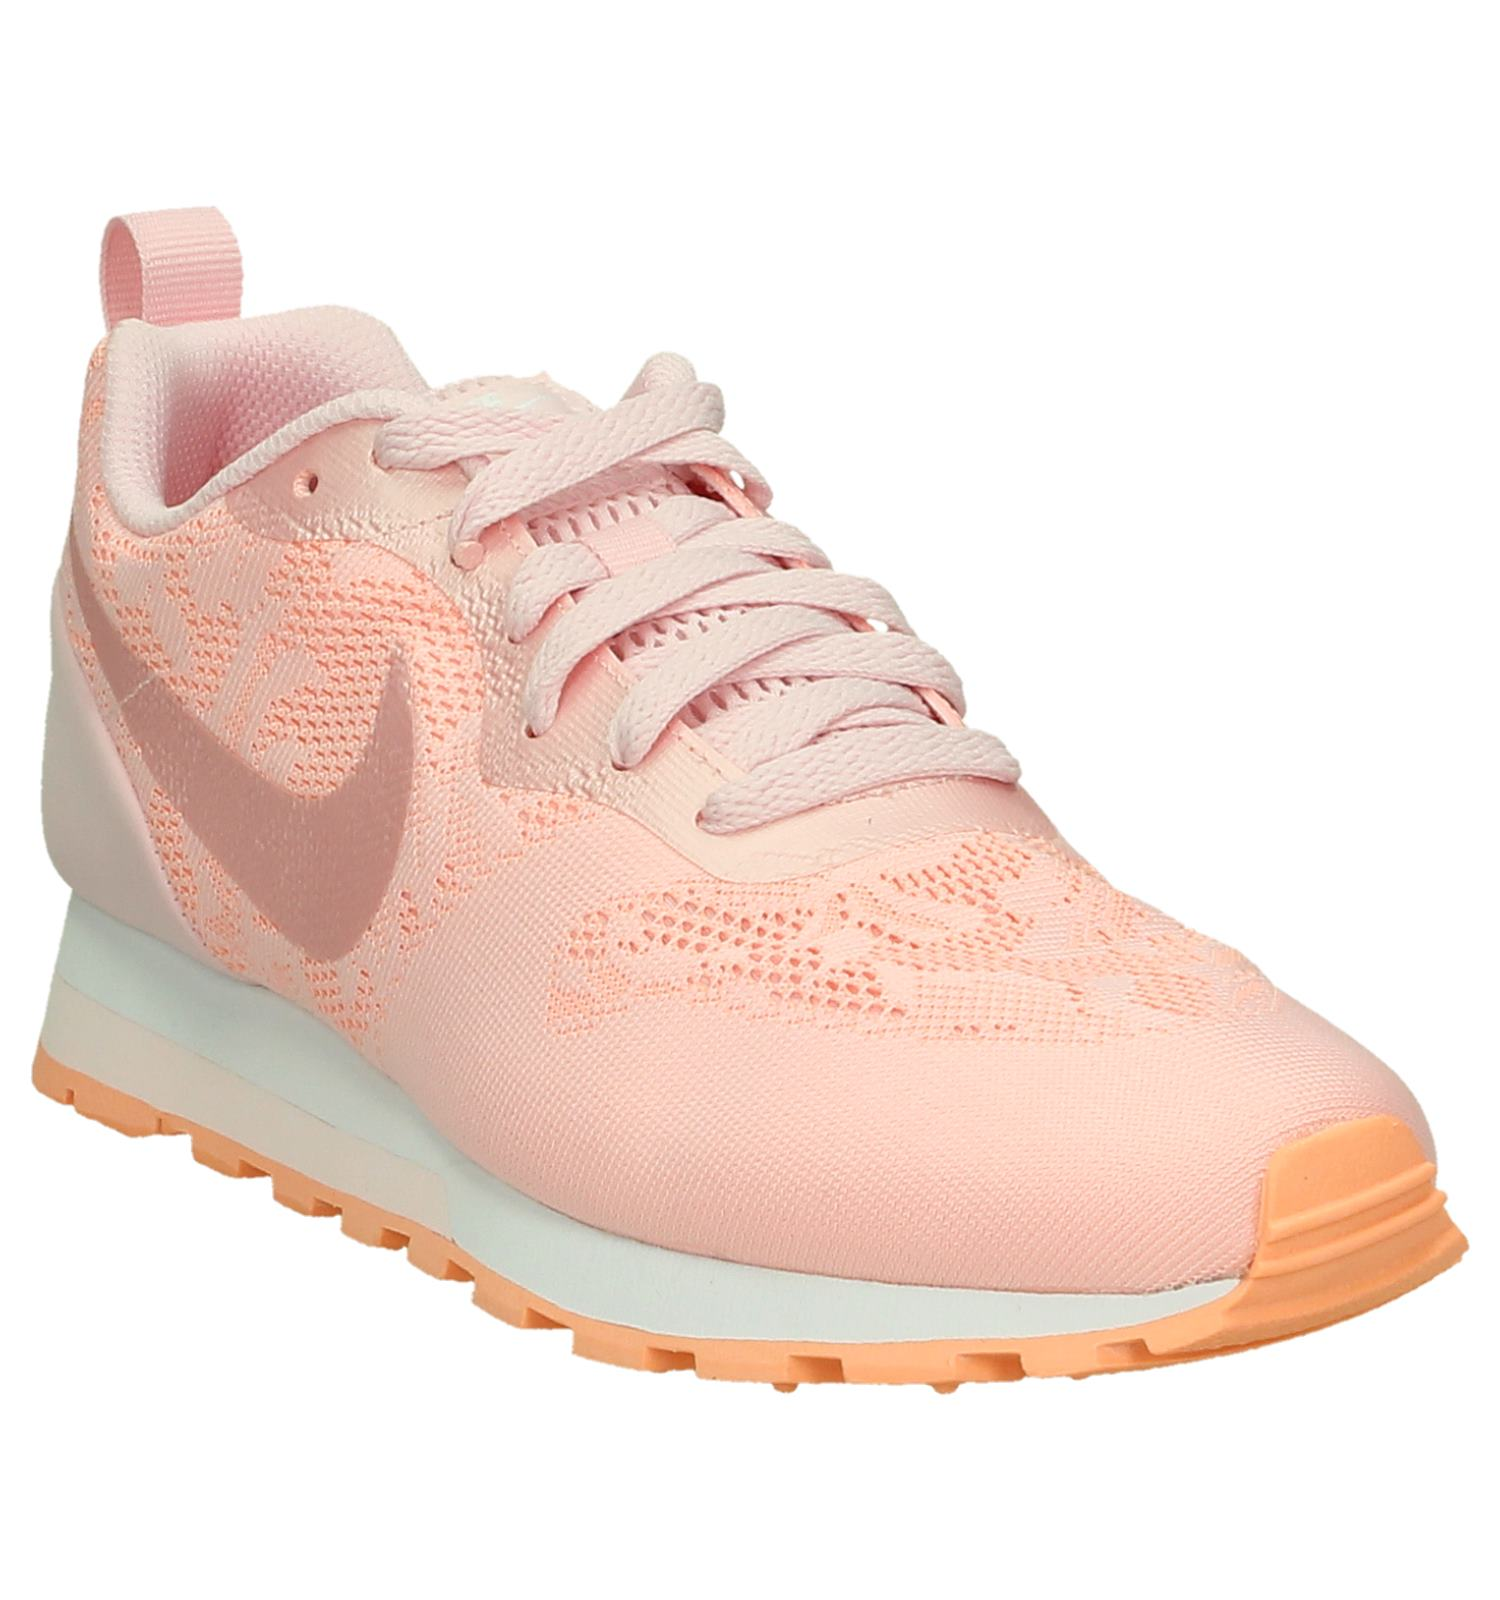 pretty nice bb4fa f59a3 Roze Sneaker Nike MD Runner  TORFS.BE  Gratis verzend en ret